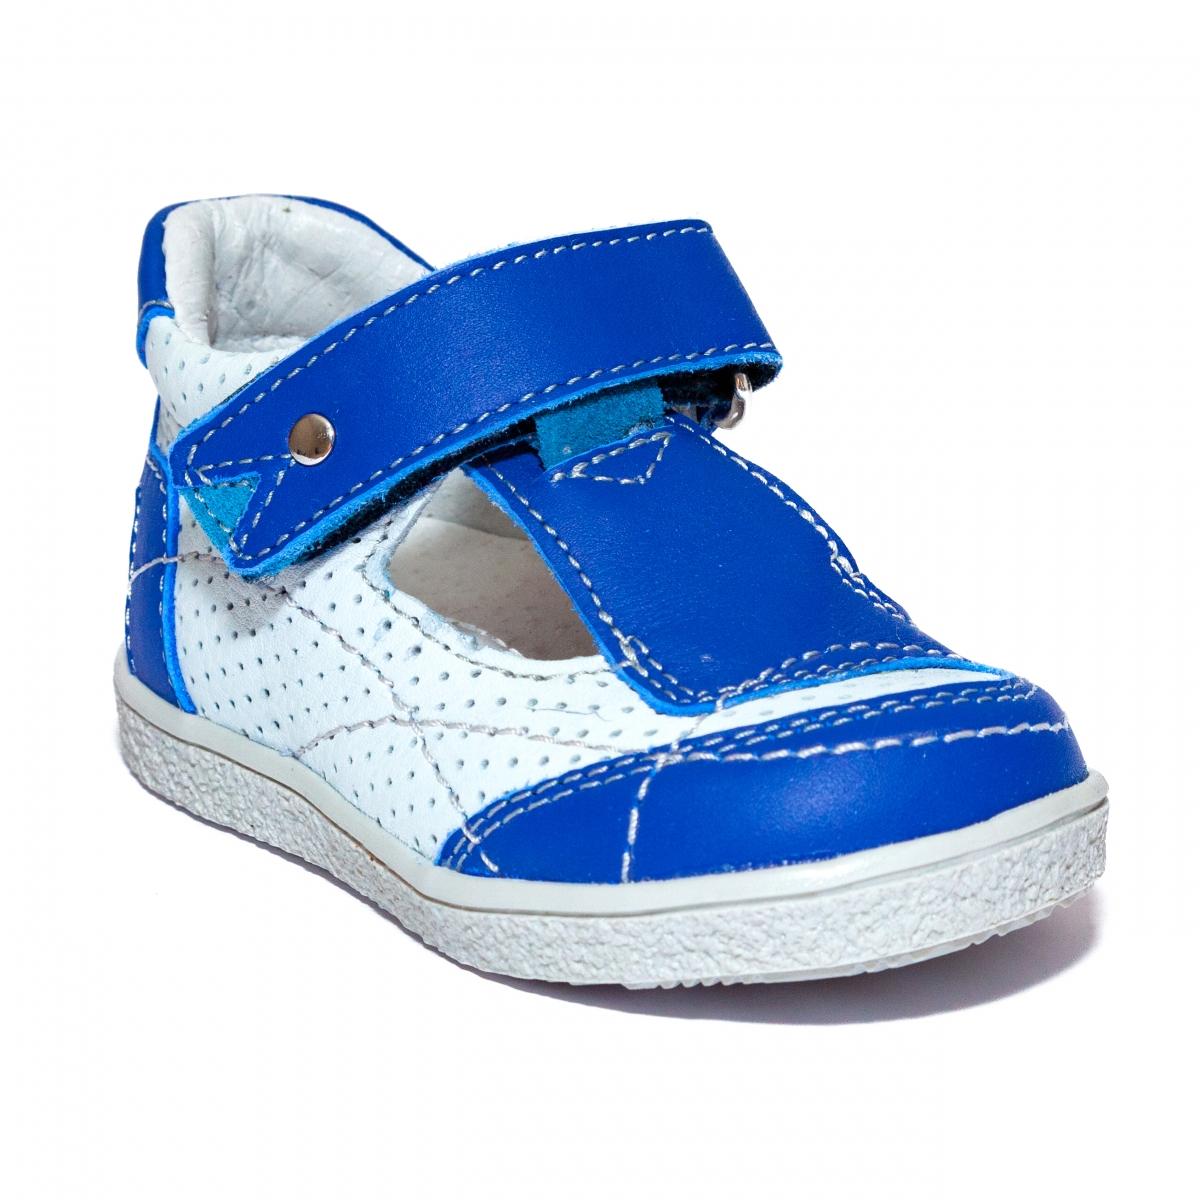 Sandalute baieti hokide 208 albastru alb 18-25